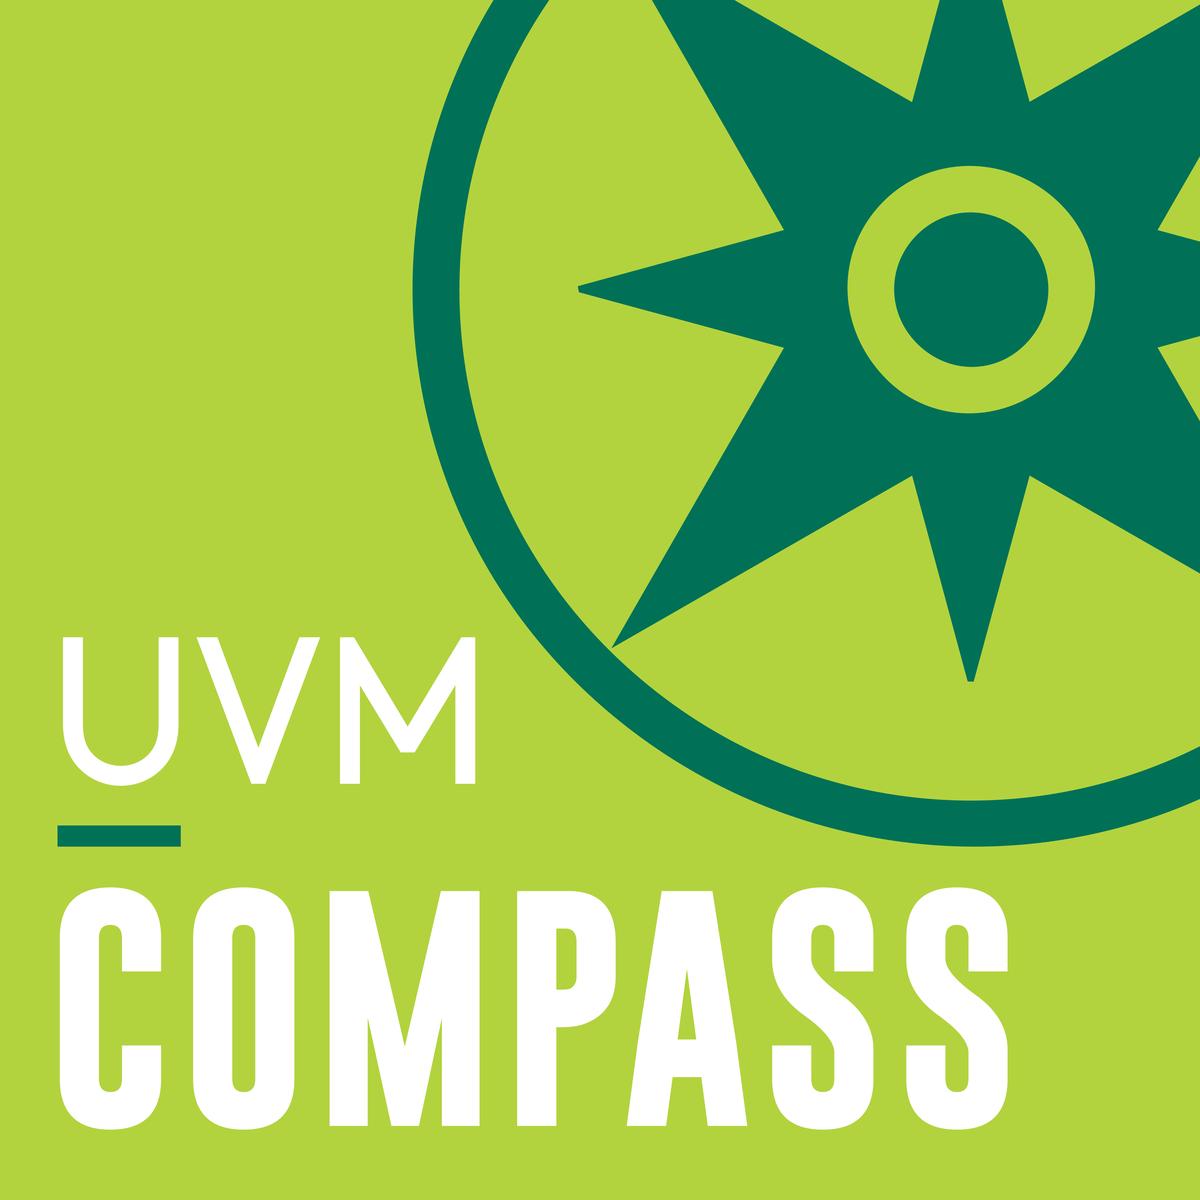 UVM Compass App